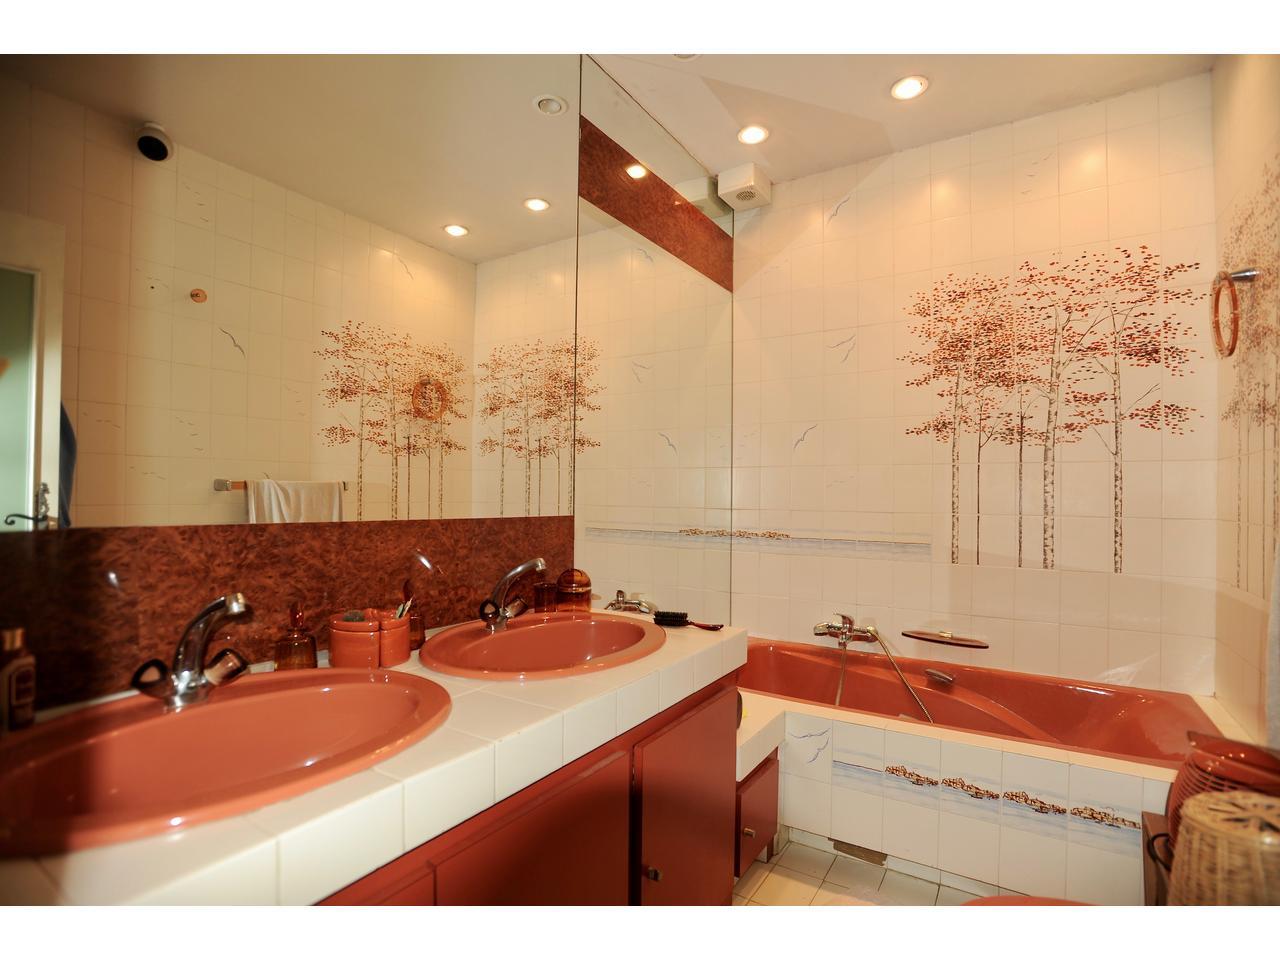 immobilier maison nice a vendre pessicart belle propriete dominante. Black Bedroom Furniture Sets. Home Design Ideas